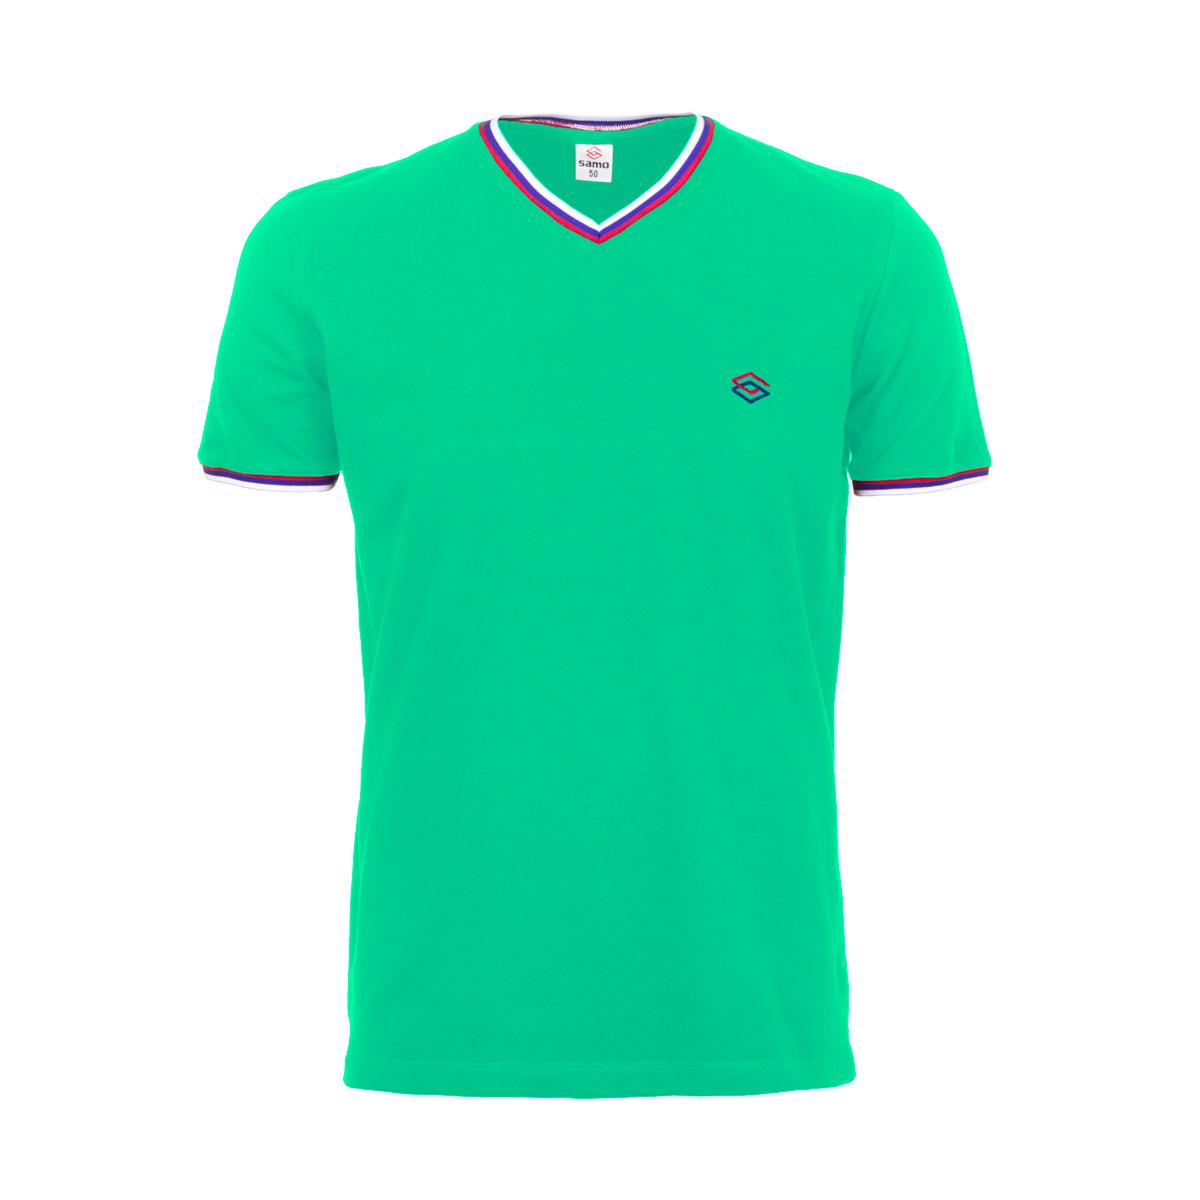 Муж. футболка арт. 04-0059 Ментол р. 48 - Мужская одежда артикул: 26315